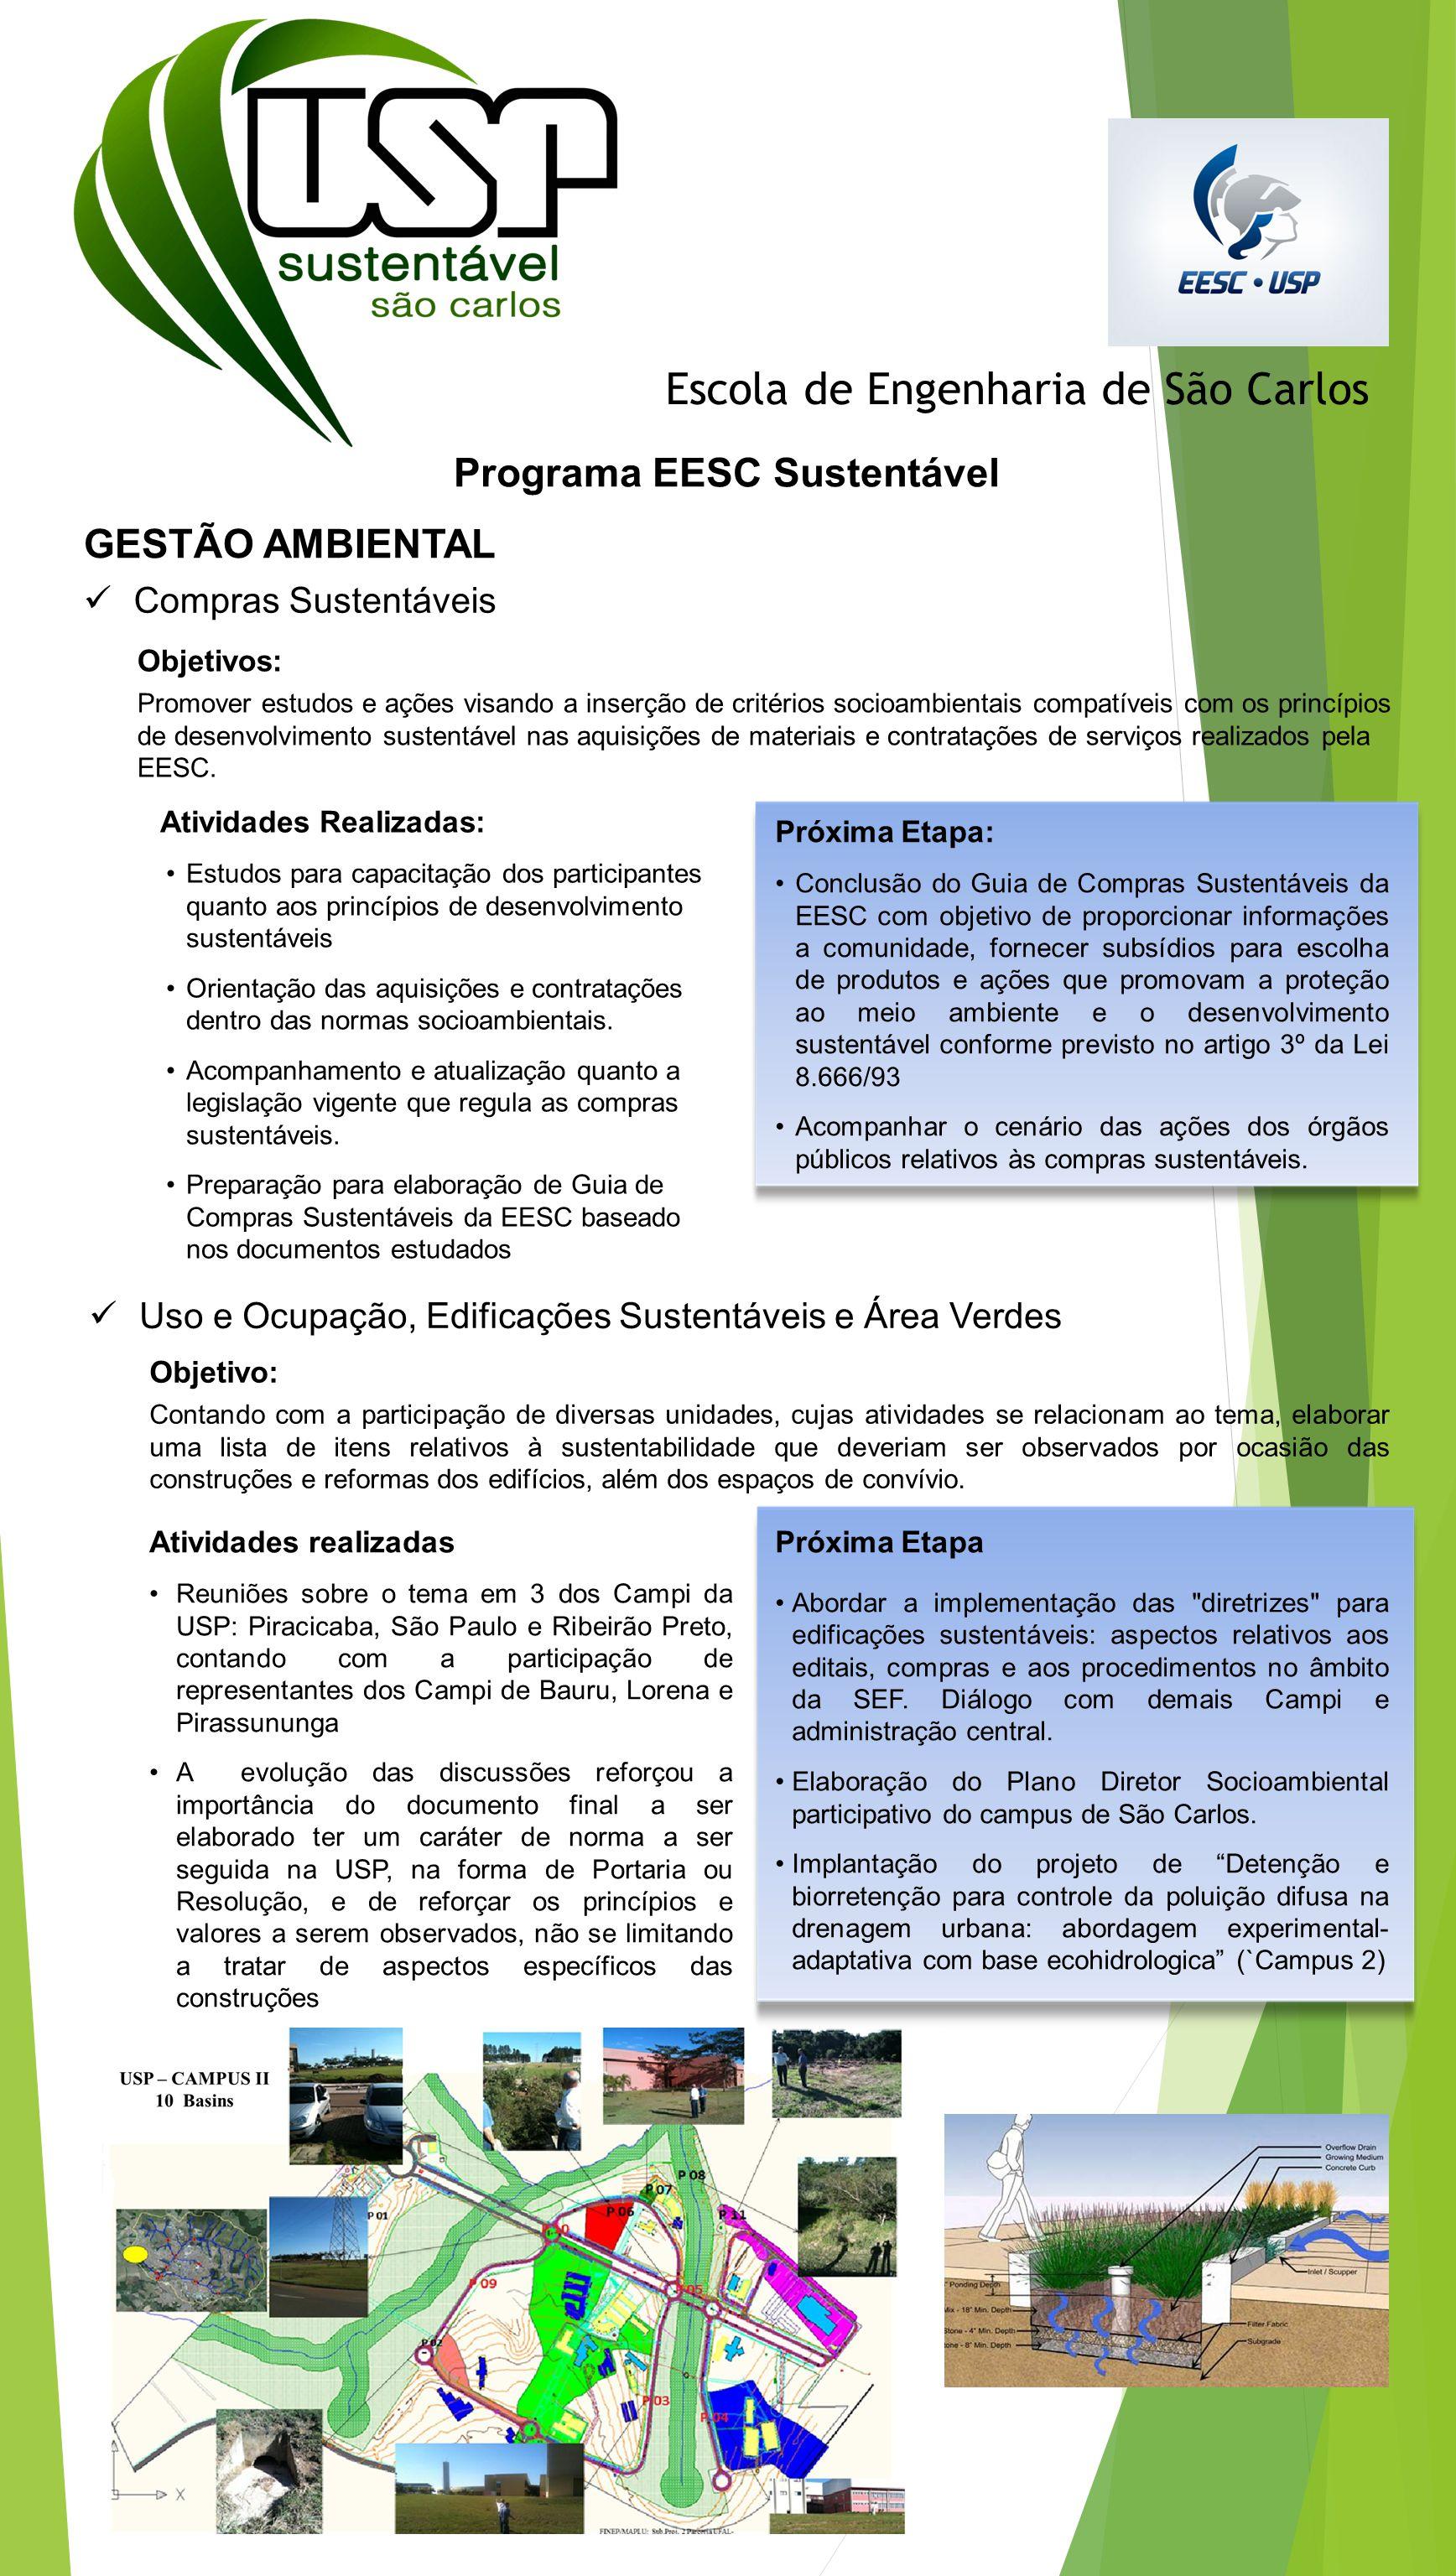 Programa EESC Sustentável